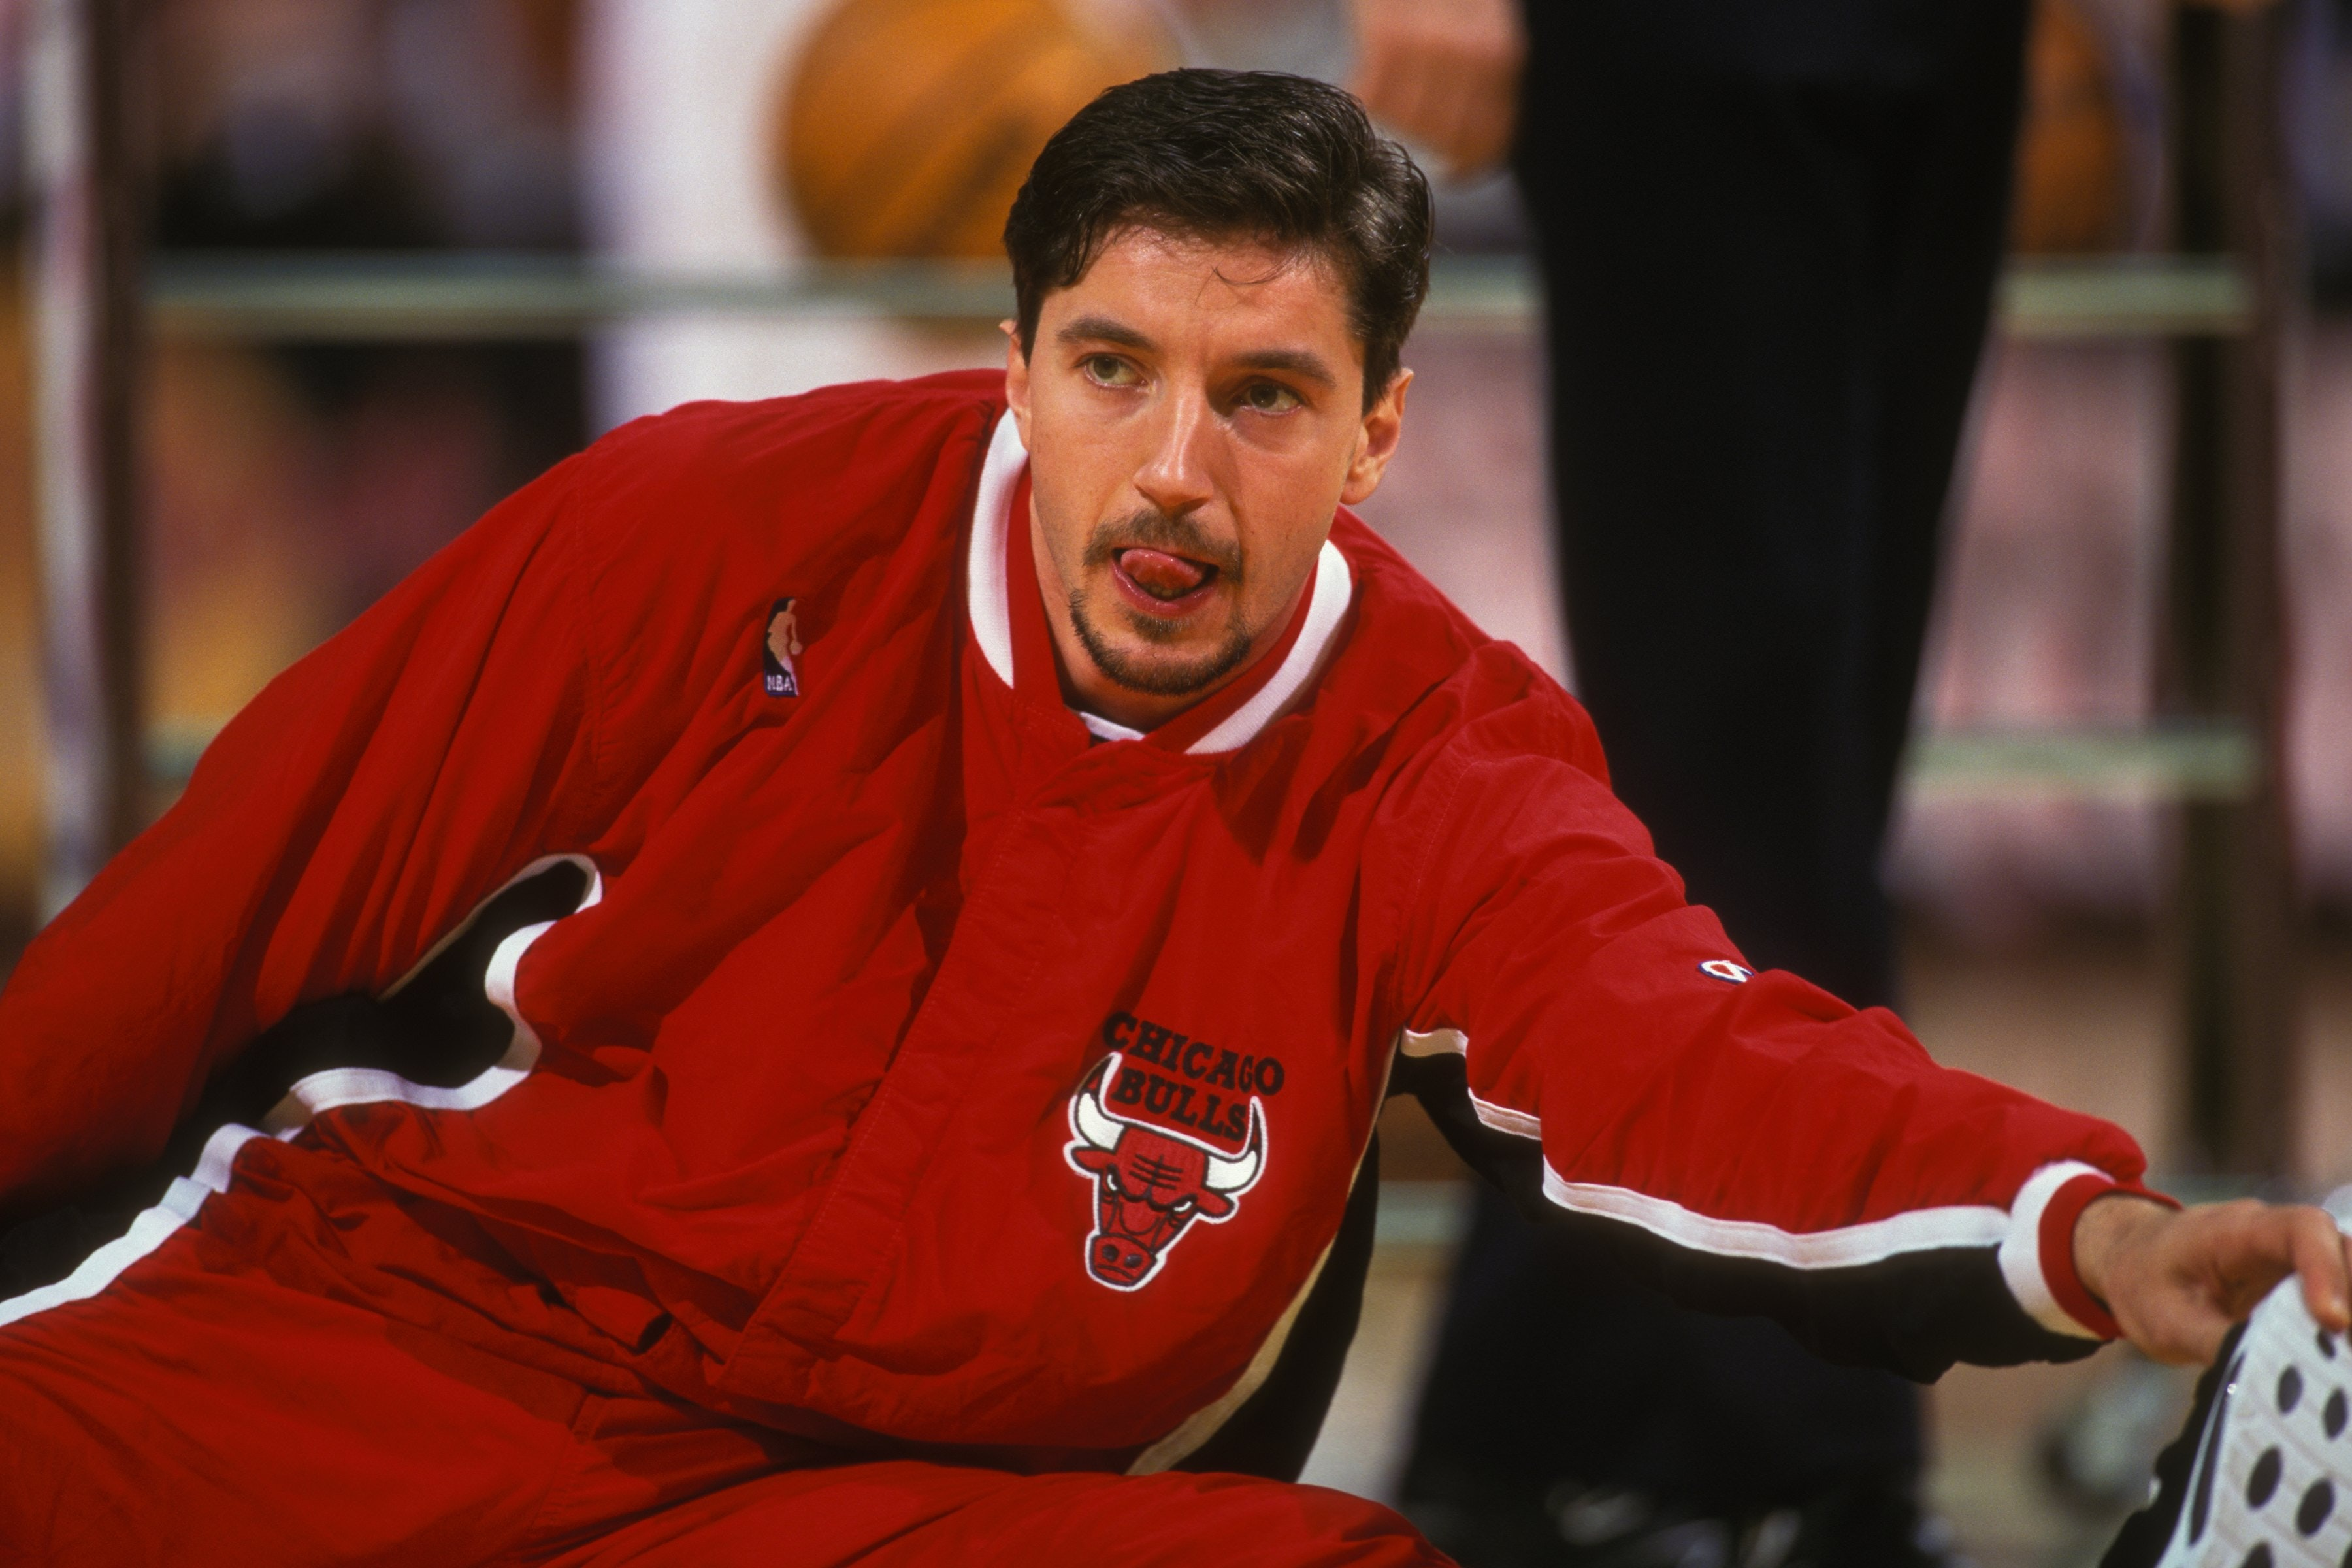 Toni Kukoc – Chicago Bulls